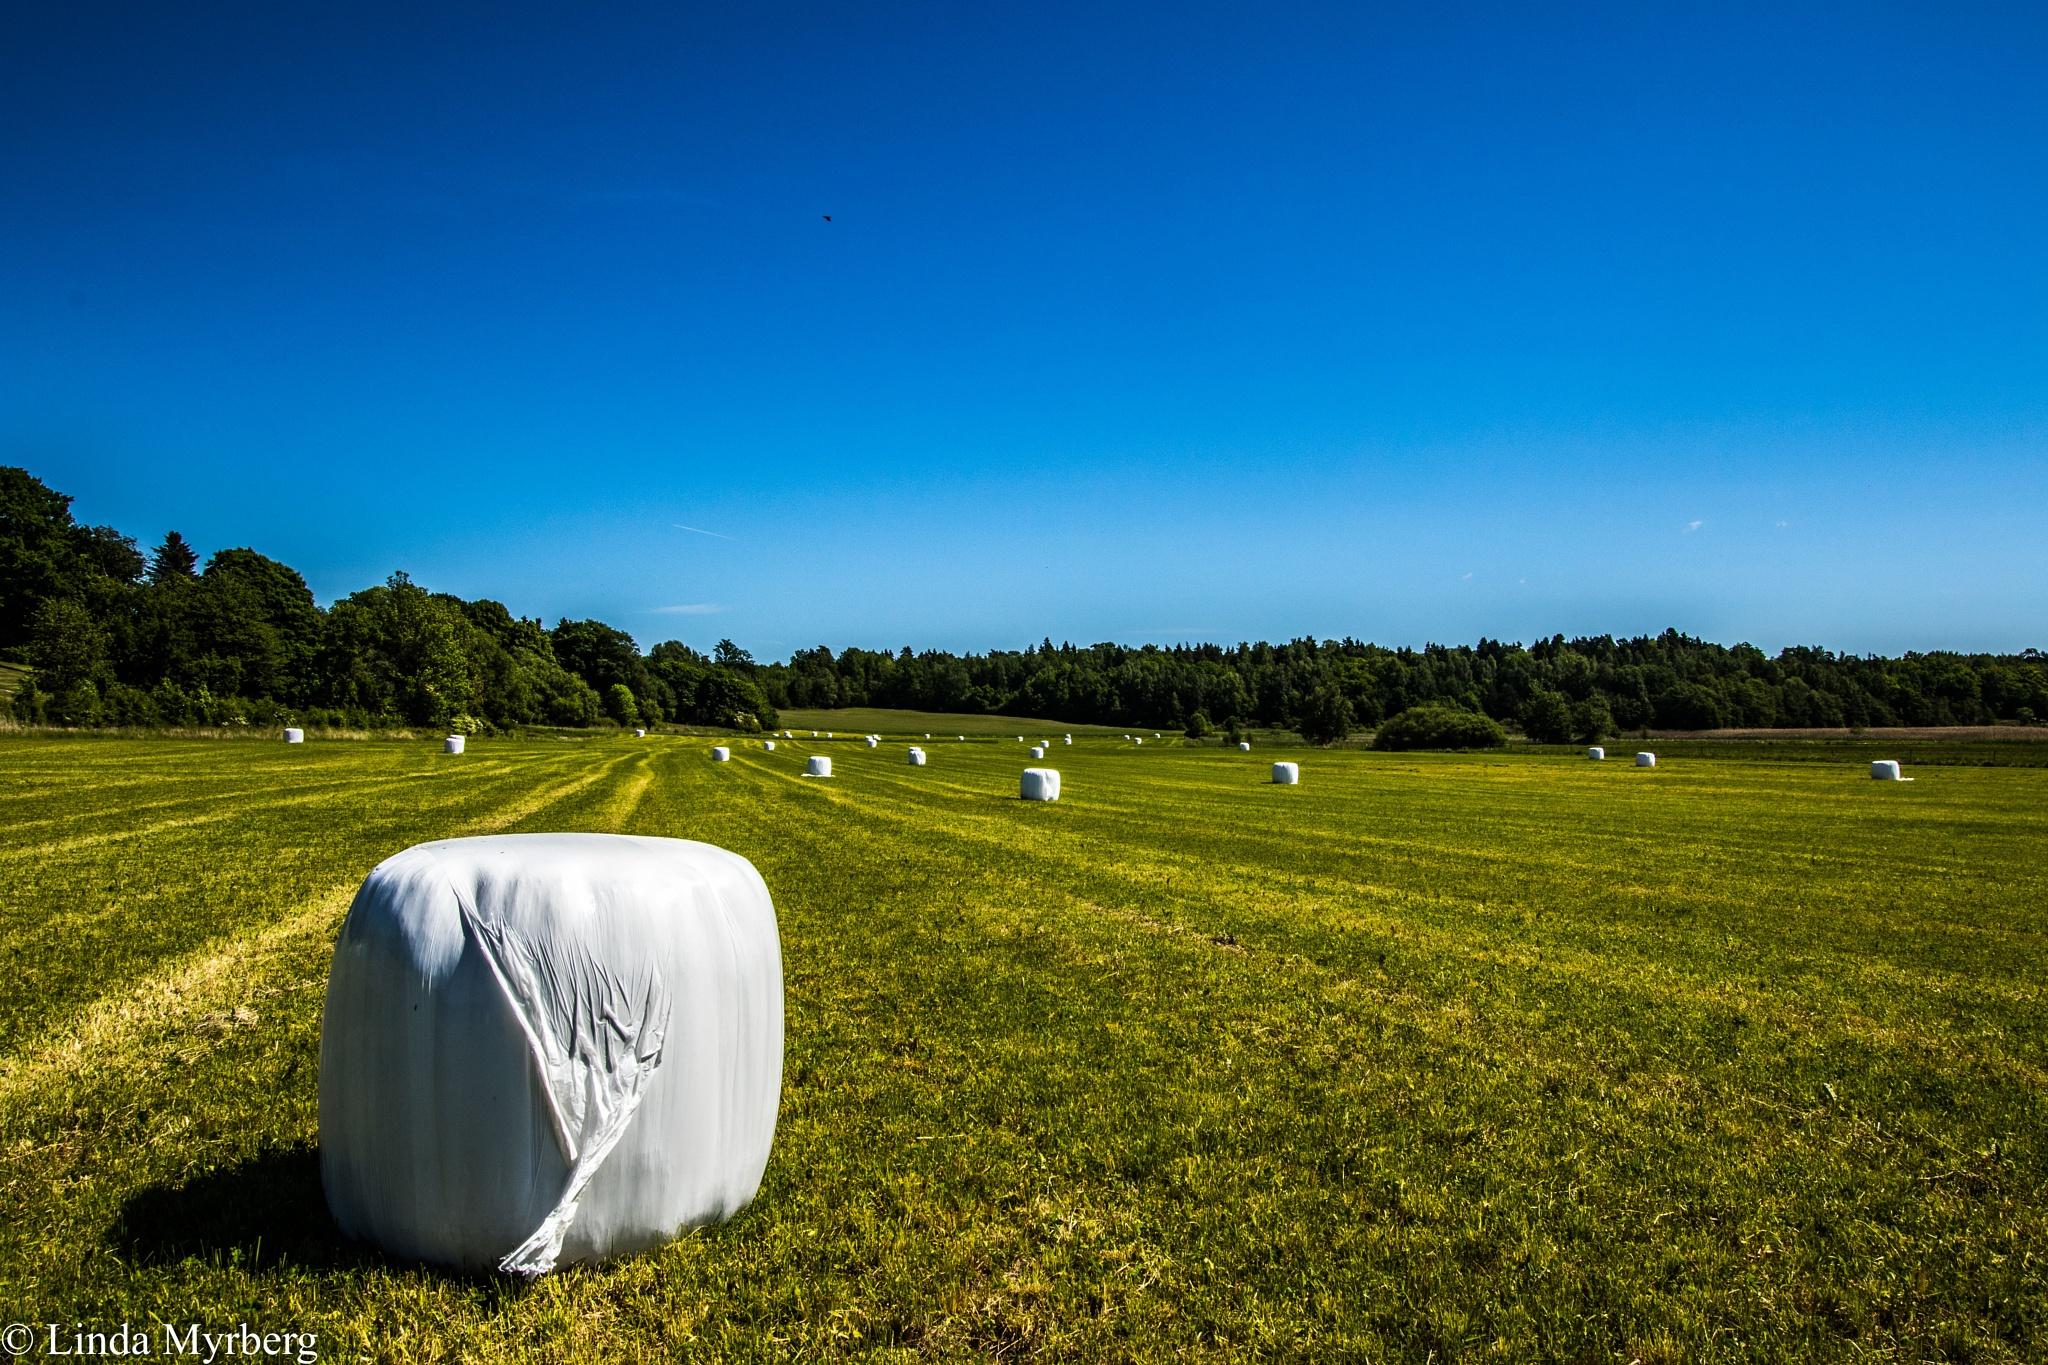 Hay bales on field by Linda Myrberg